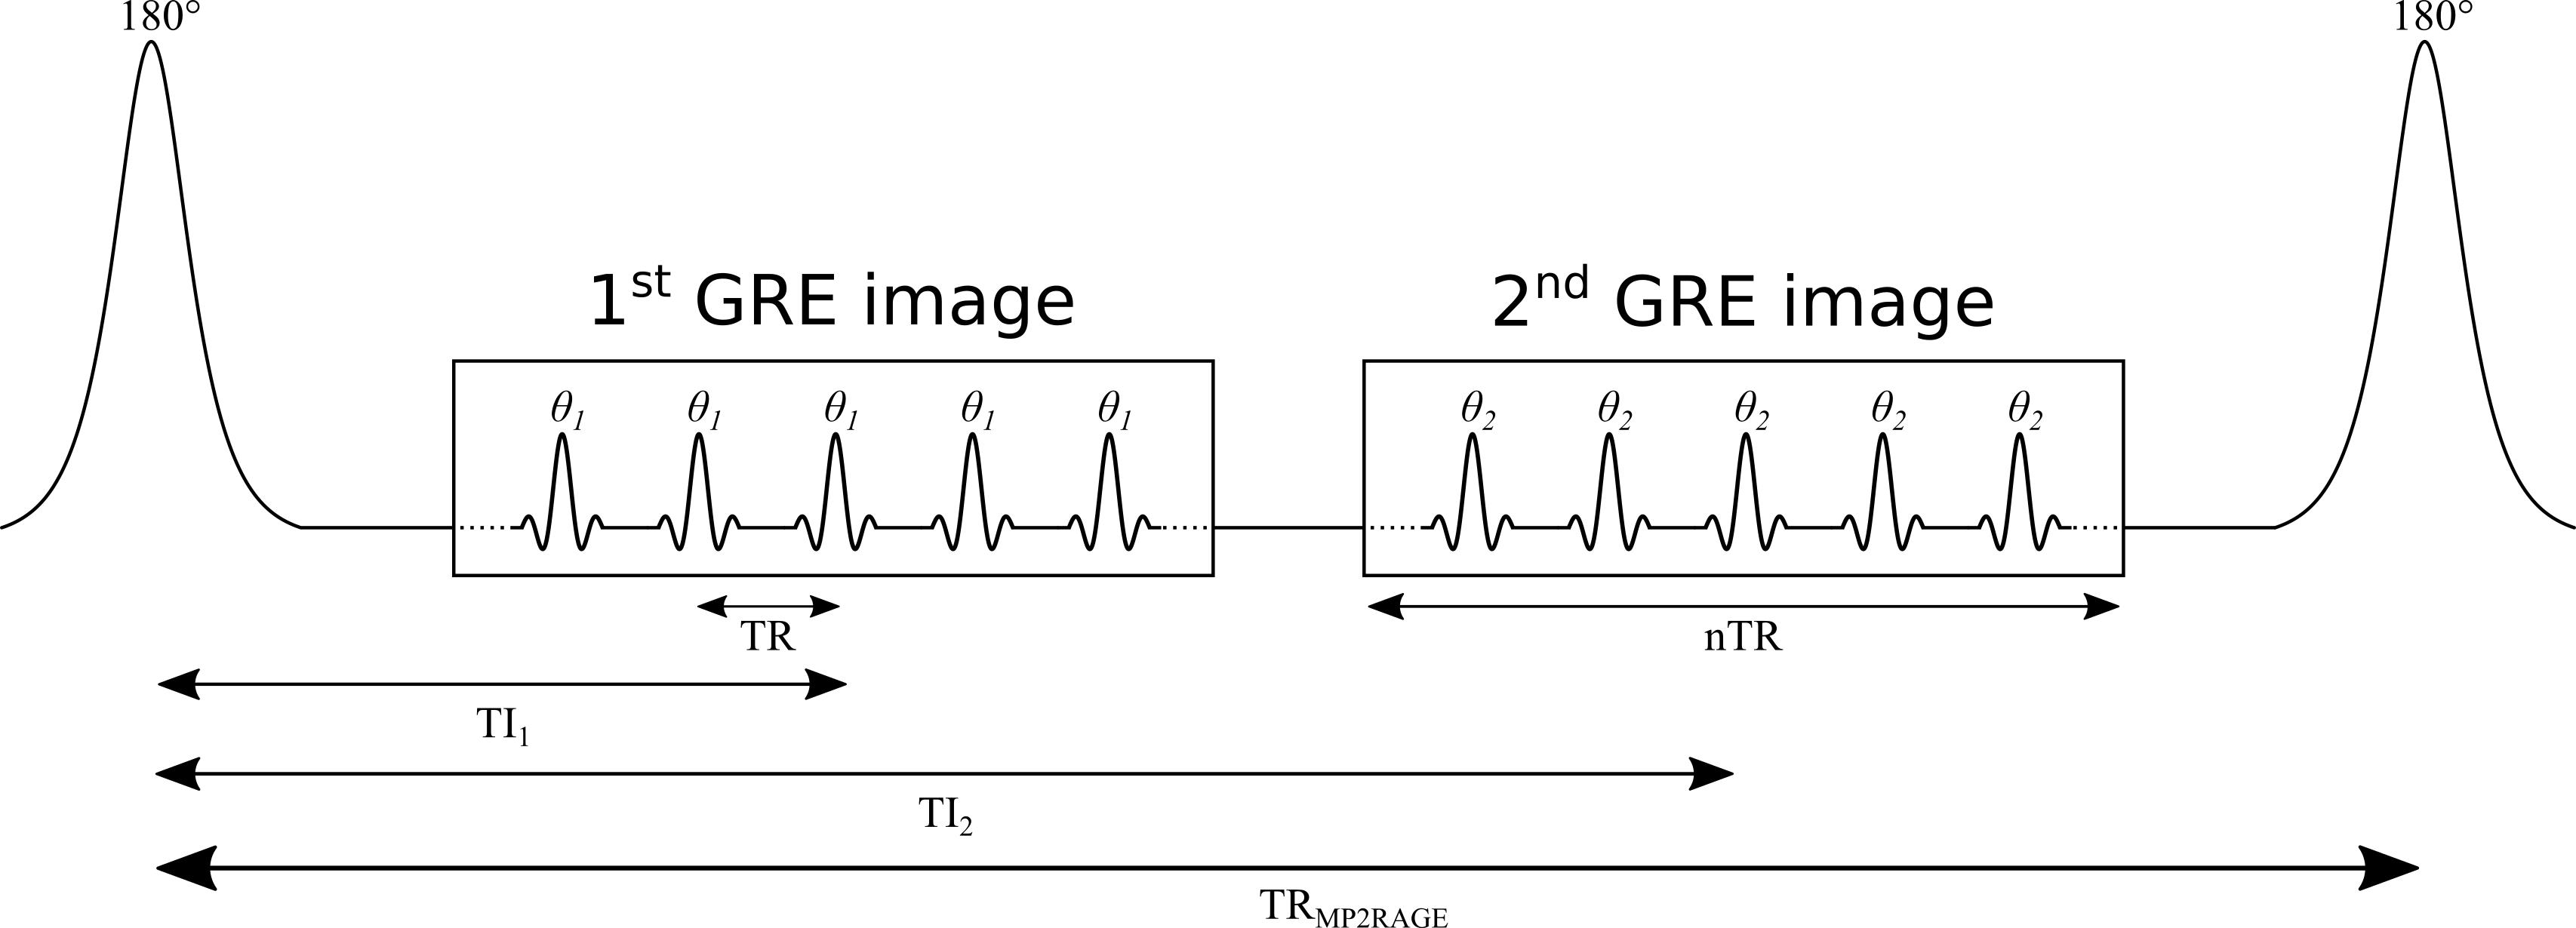 Relaxometry Series: MP2RAGE   qMRLab